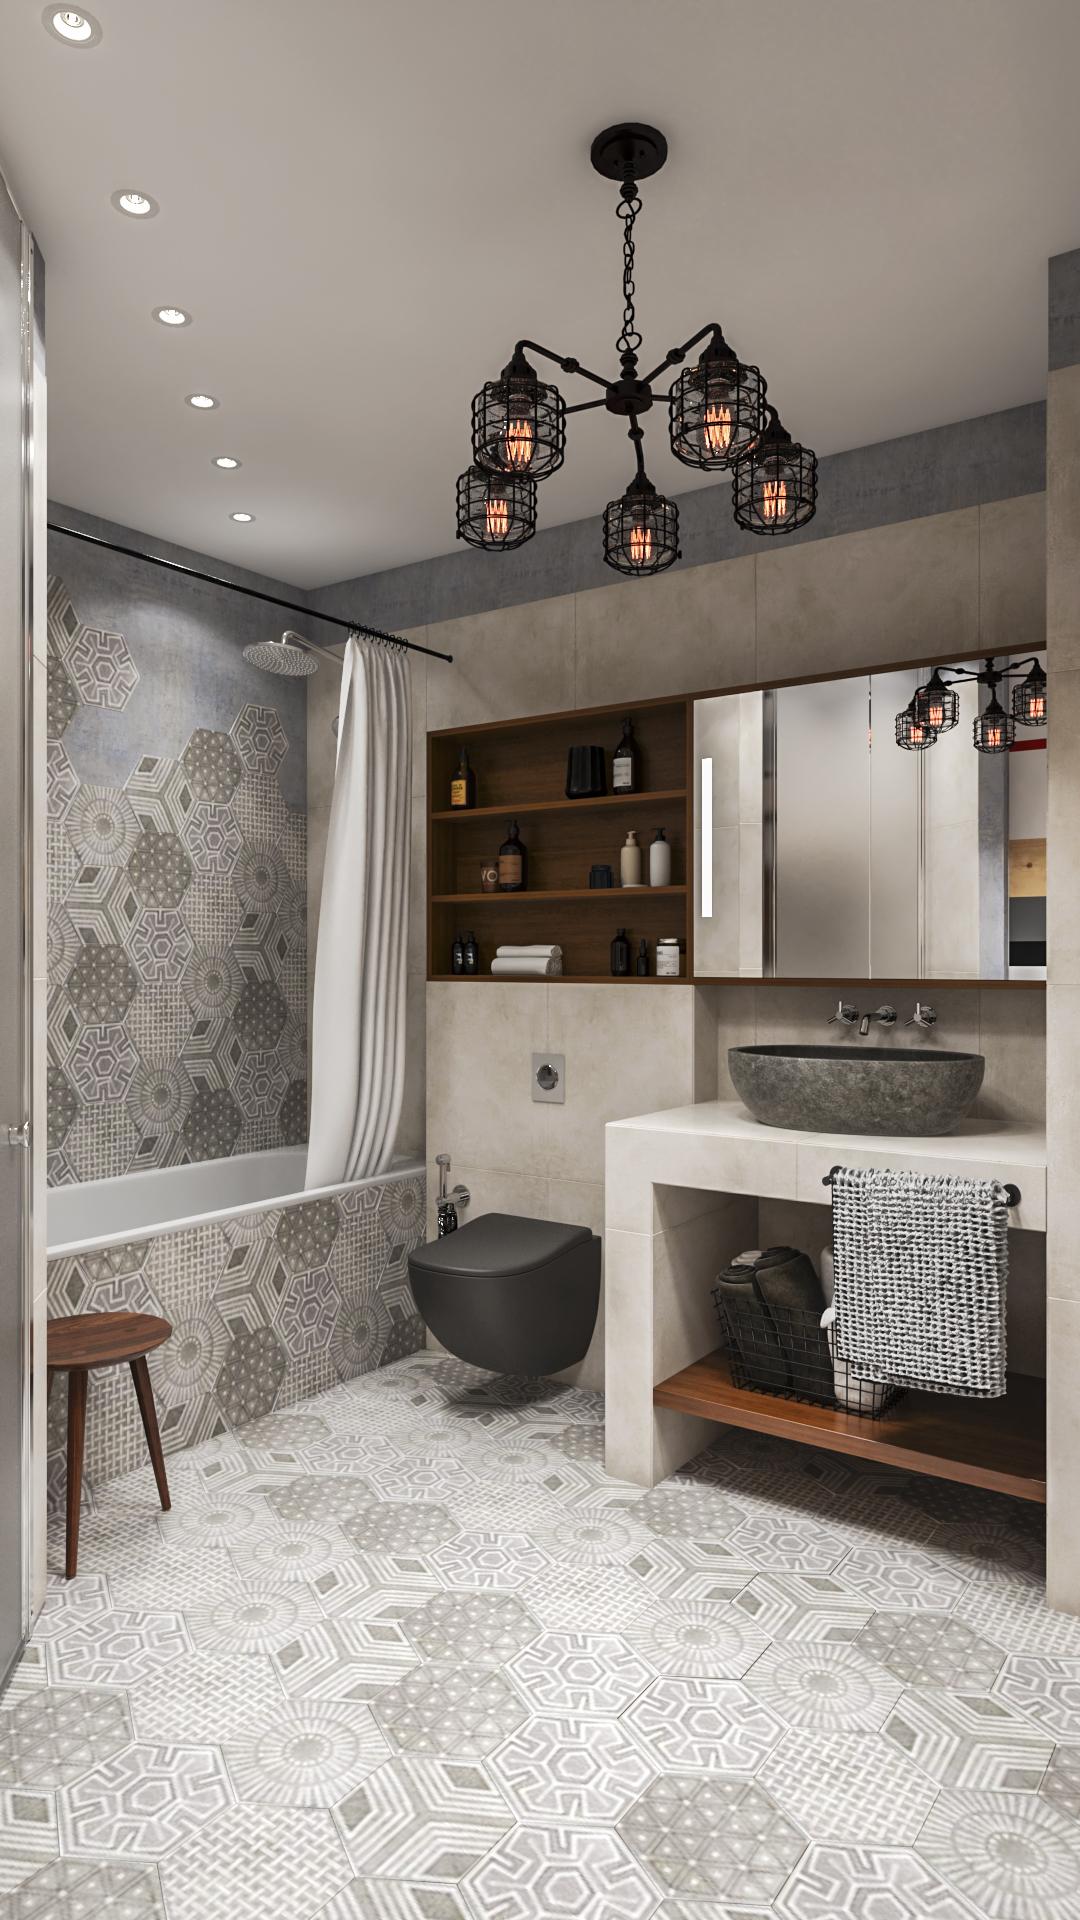 Лофт концепция в ванной комнате